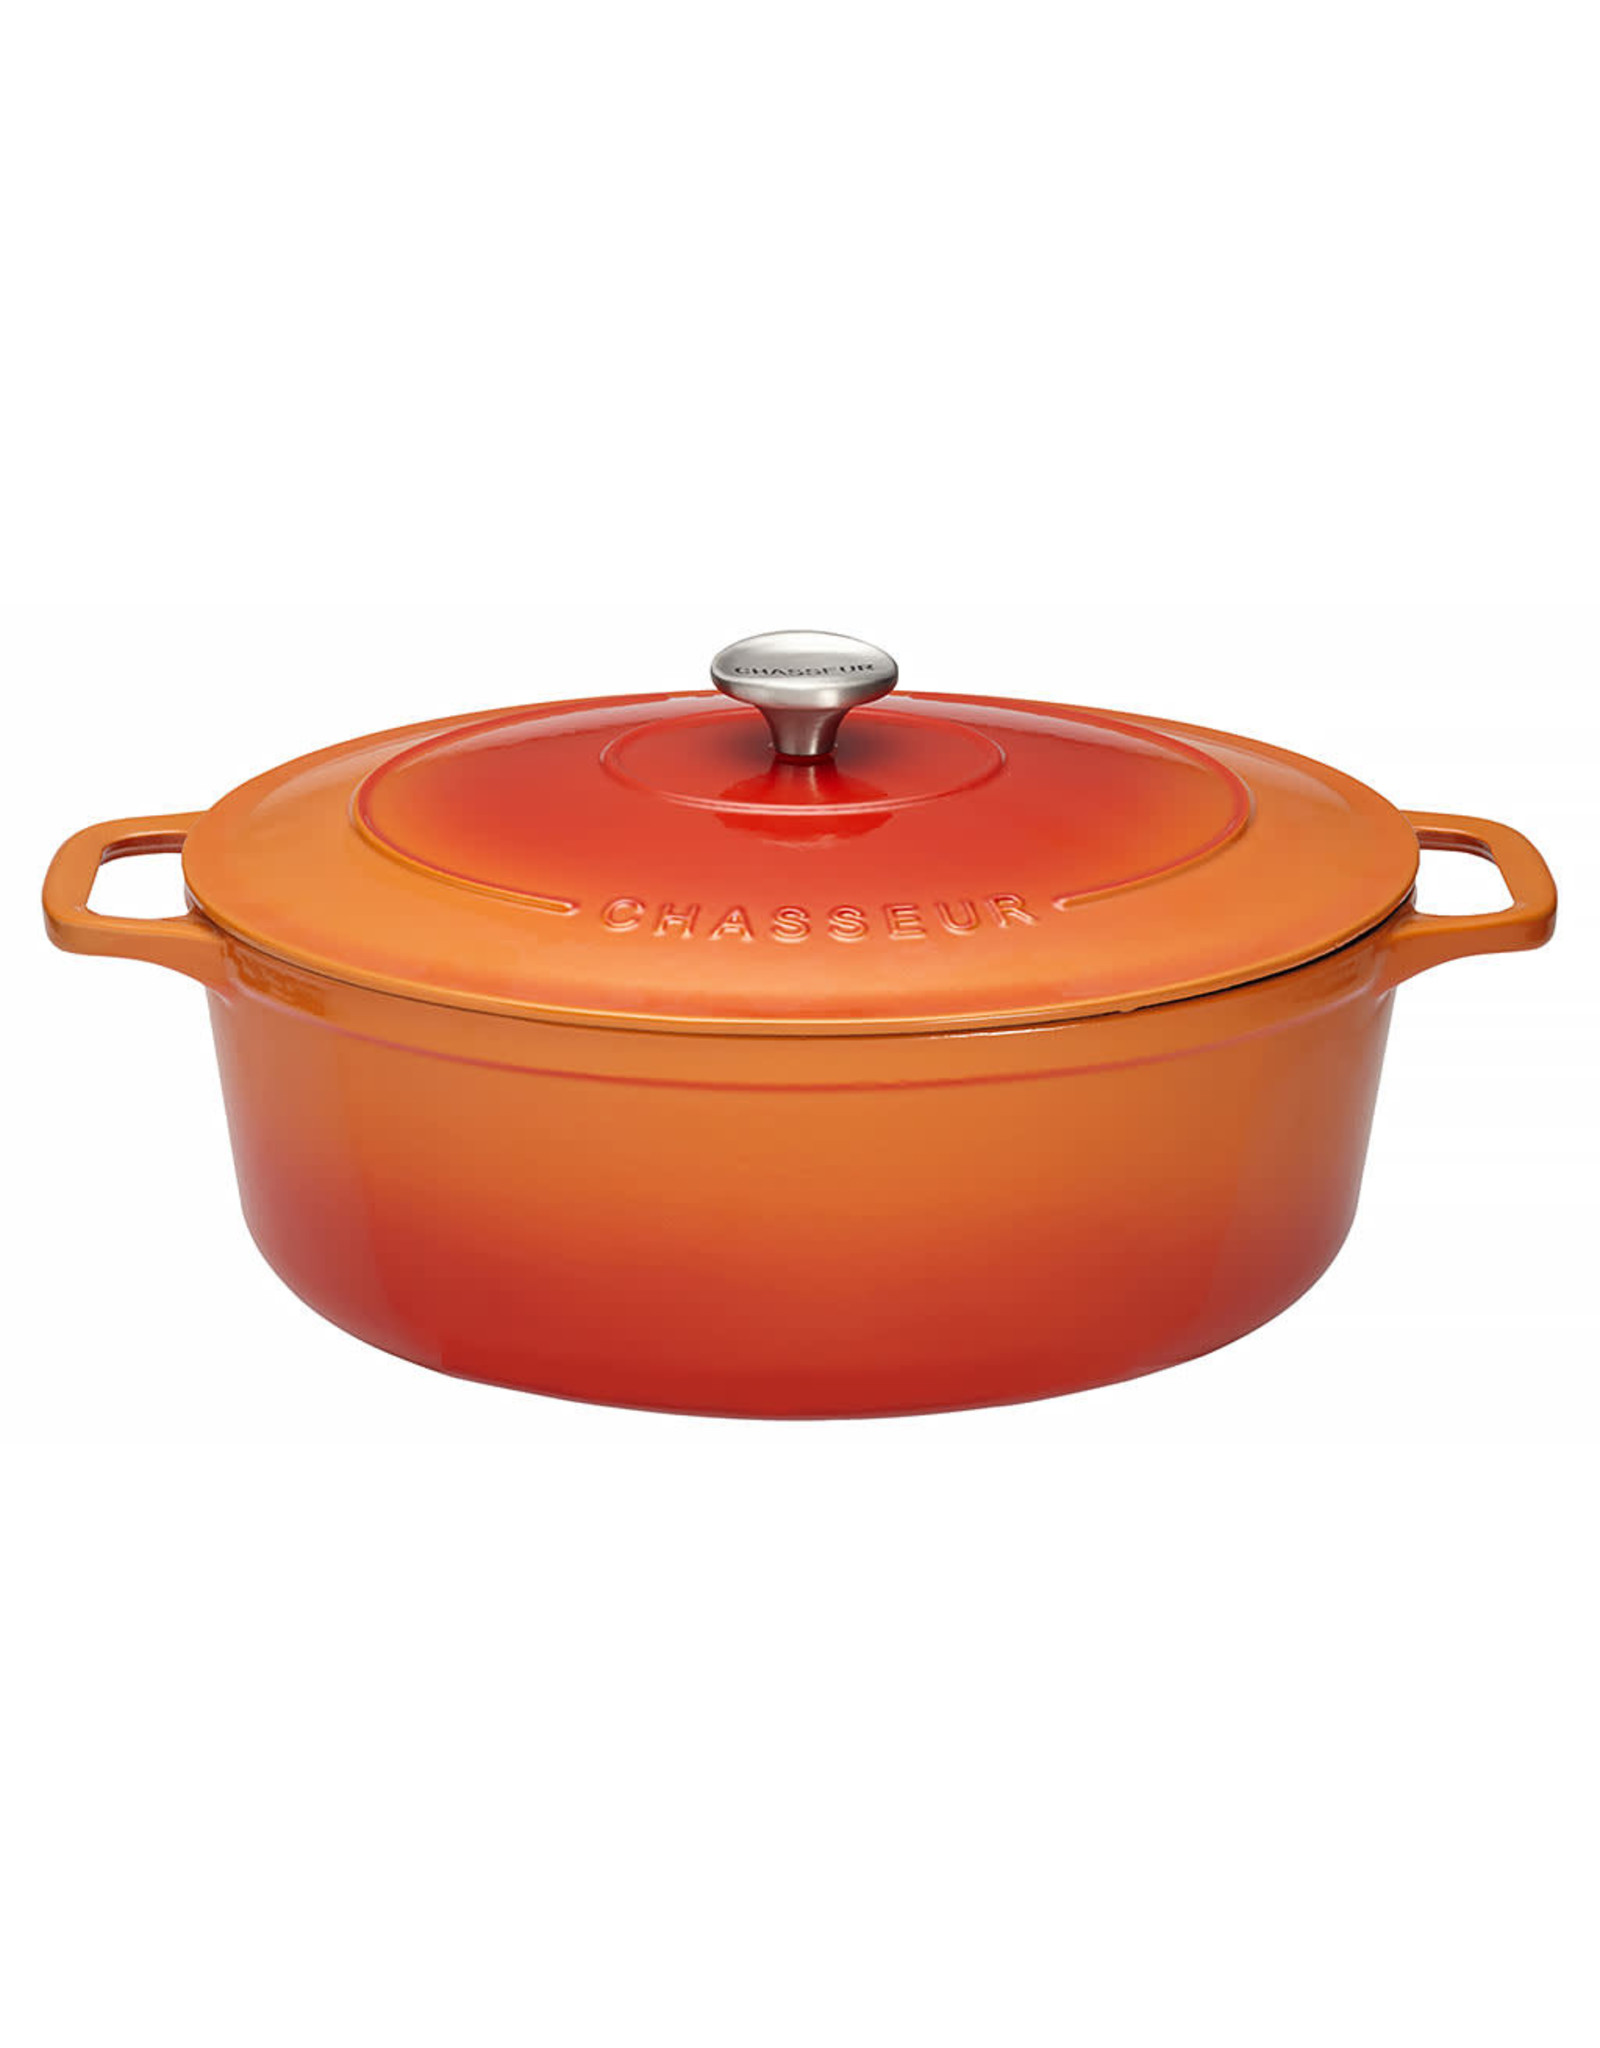 Chasseur Cocotte ovaal 29cm 5L oranje